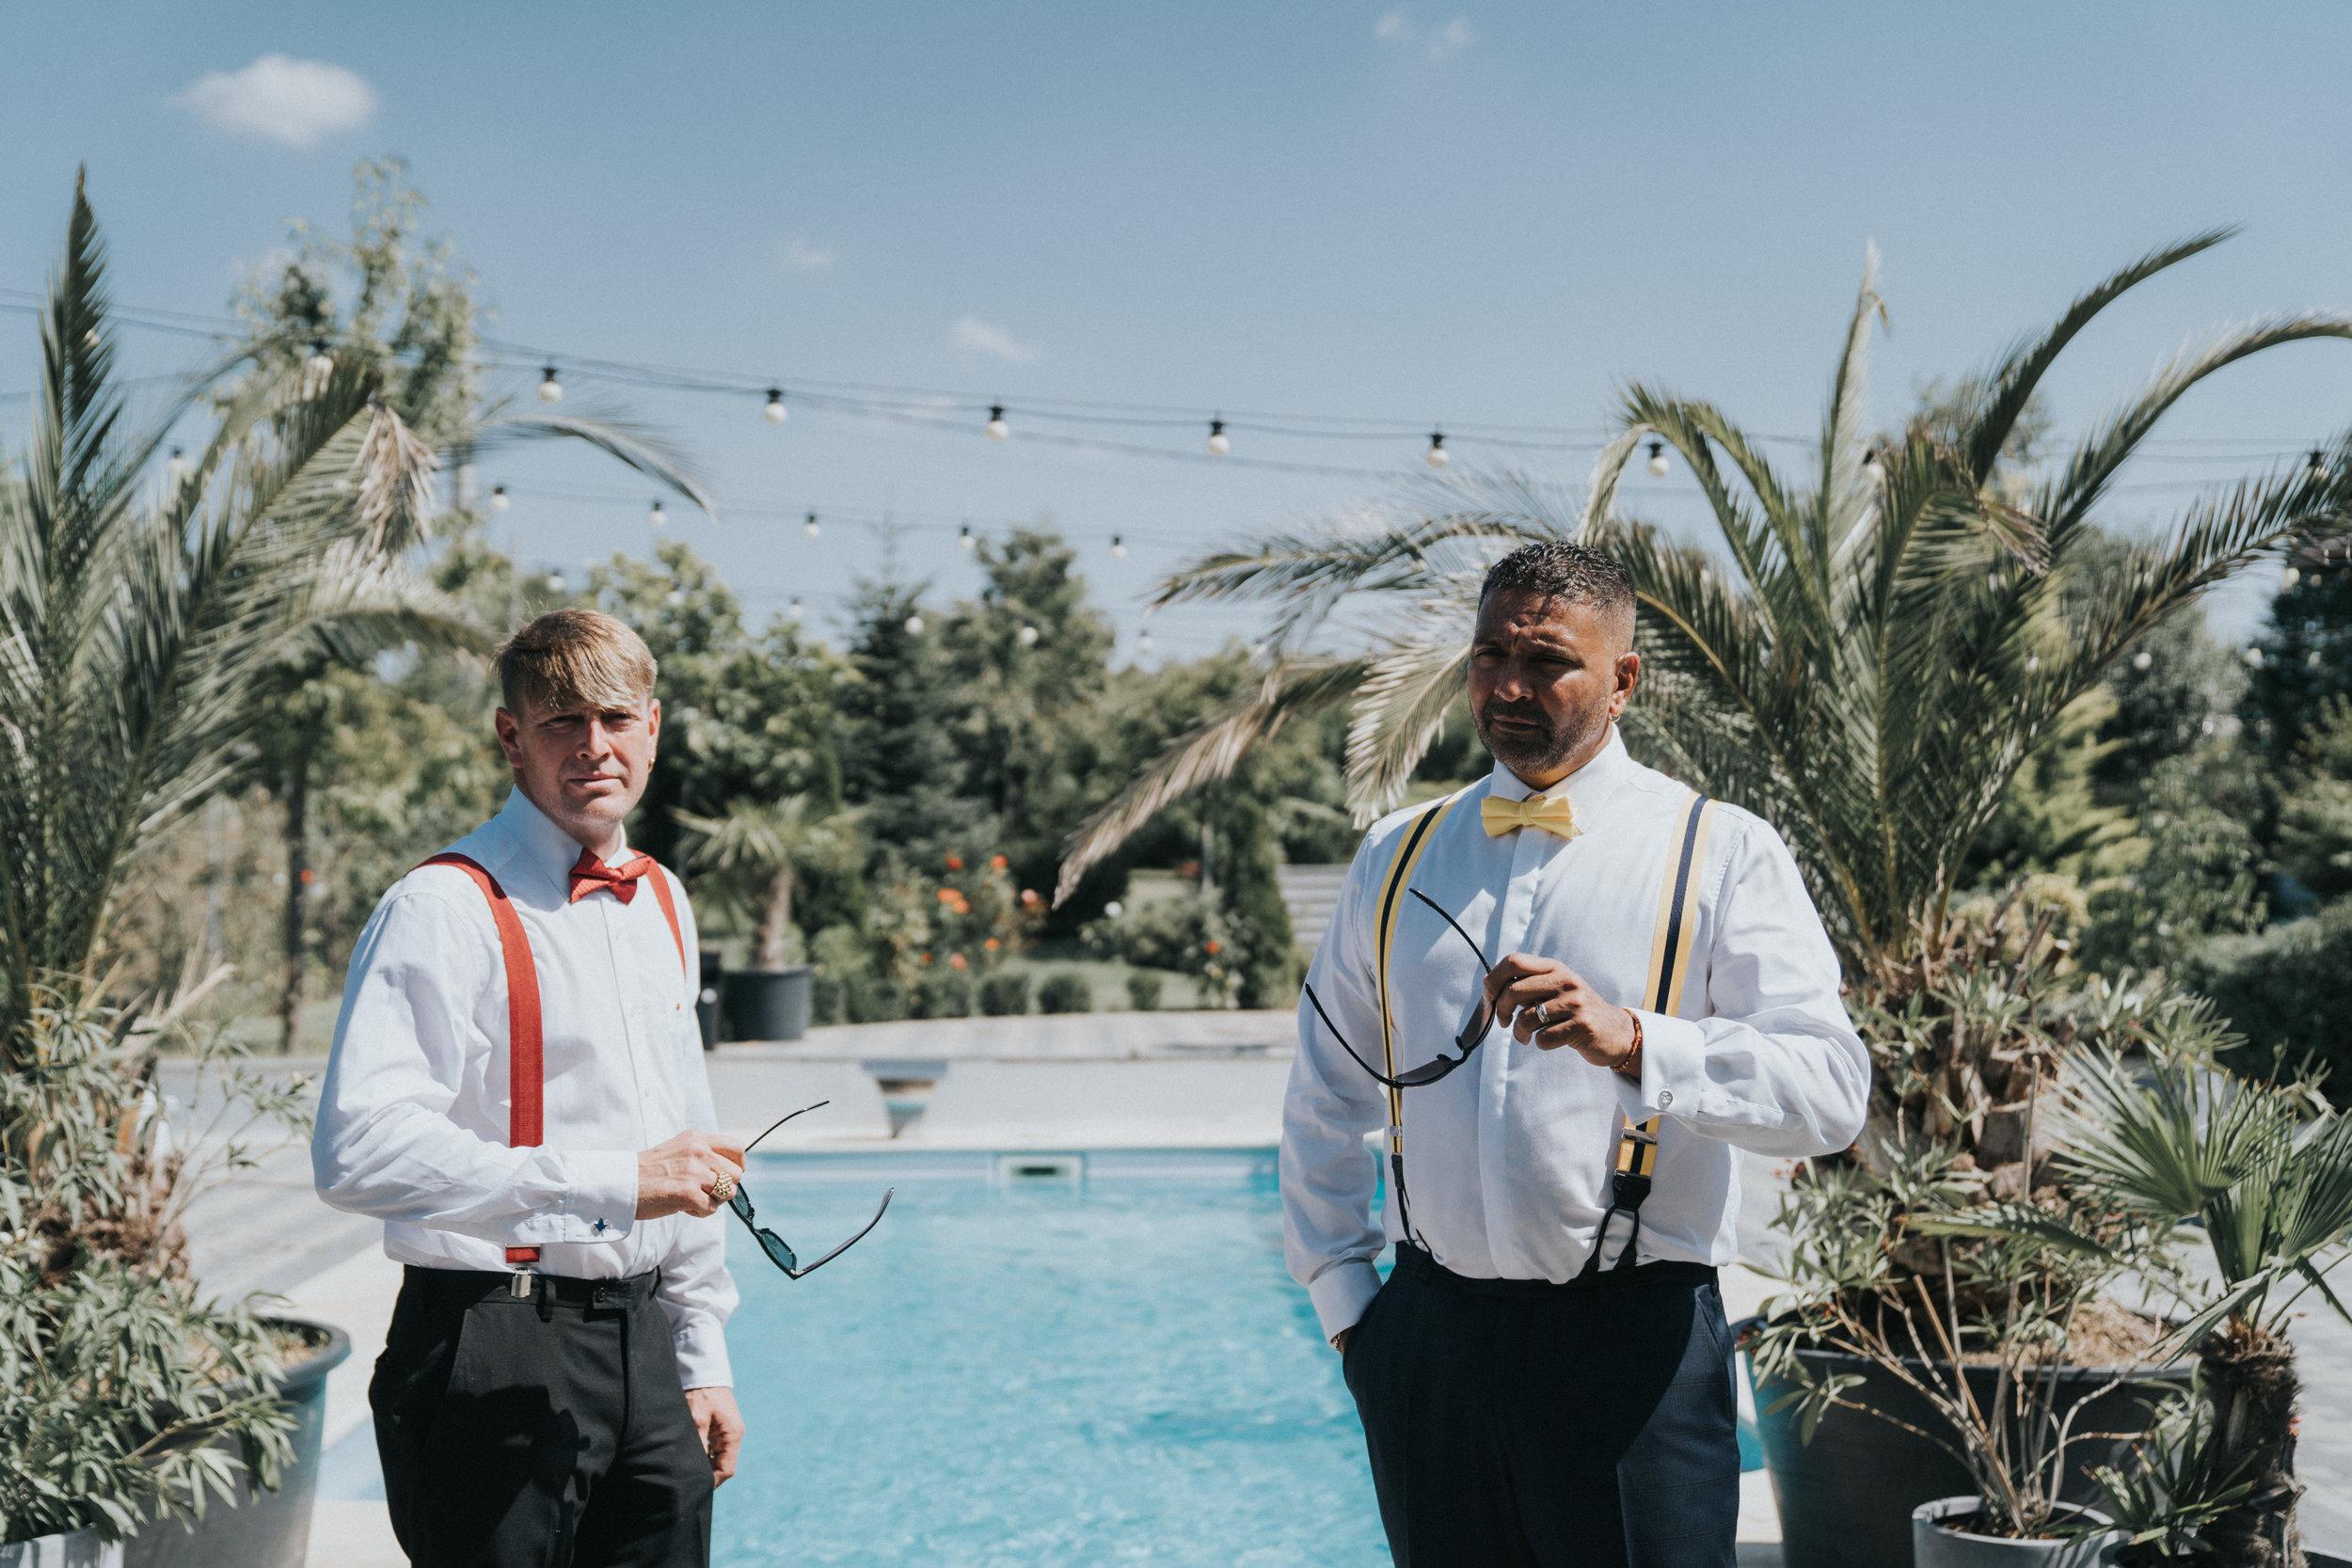 london-romania-destination-wedding-photographer-videographer-09